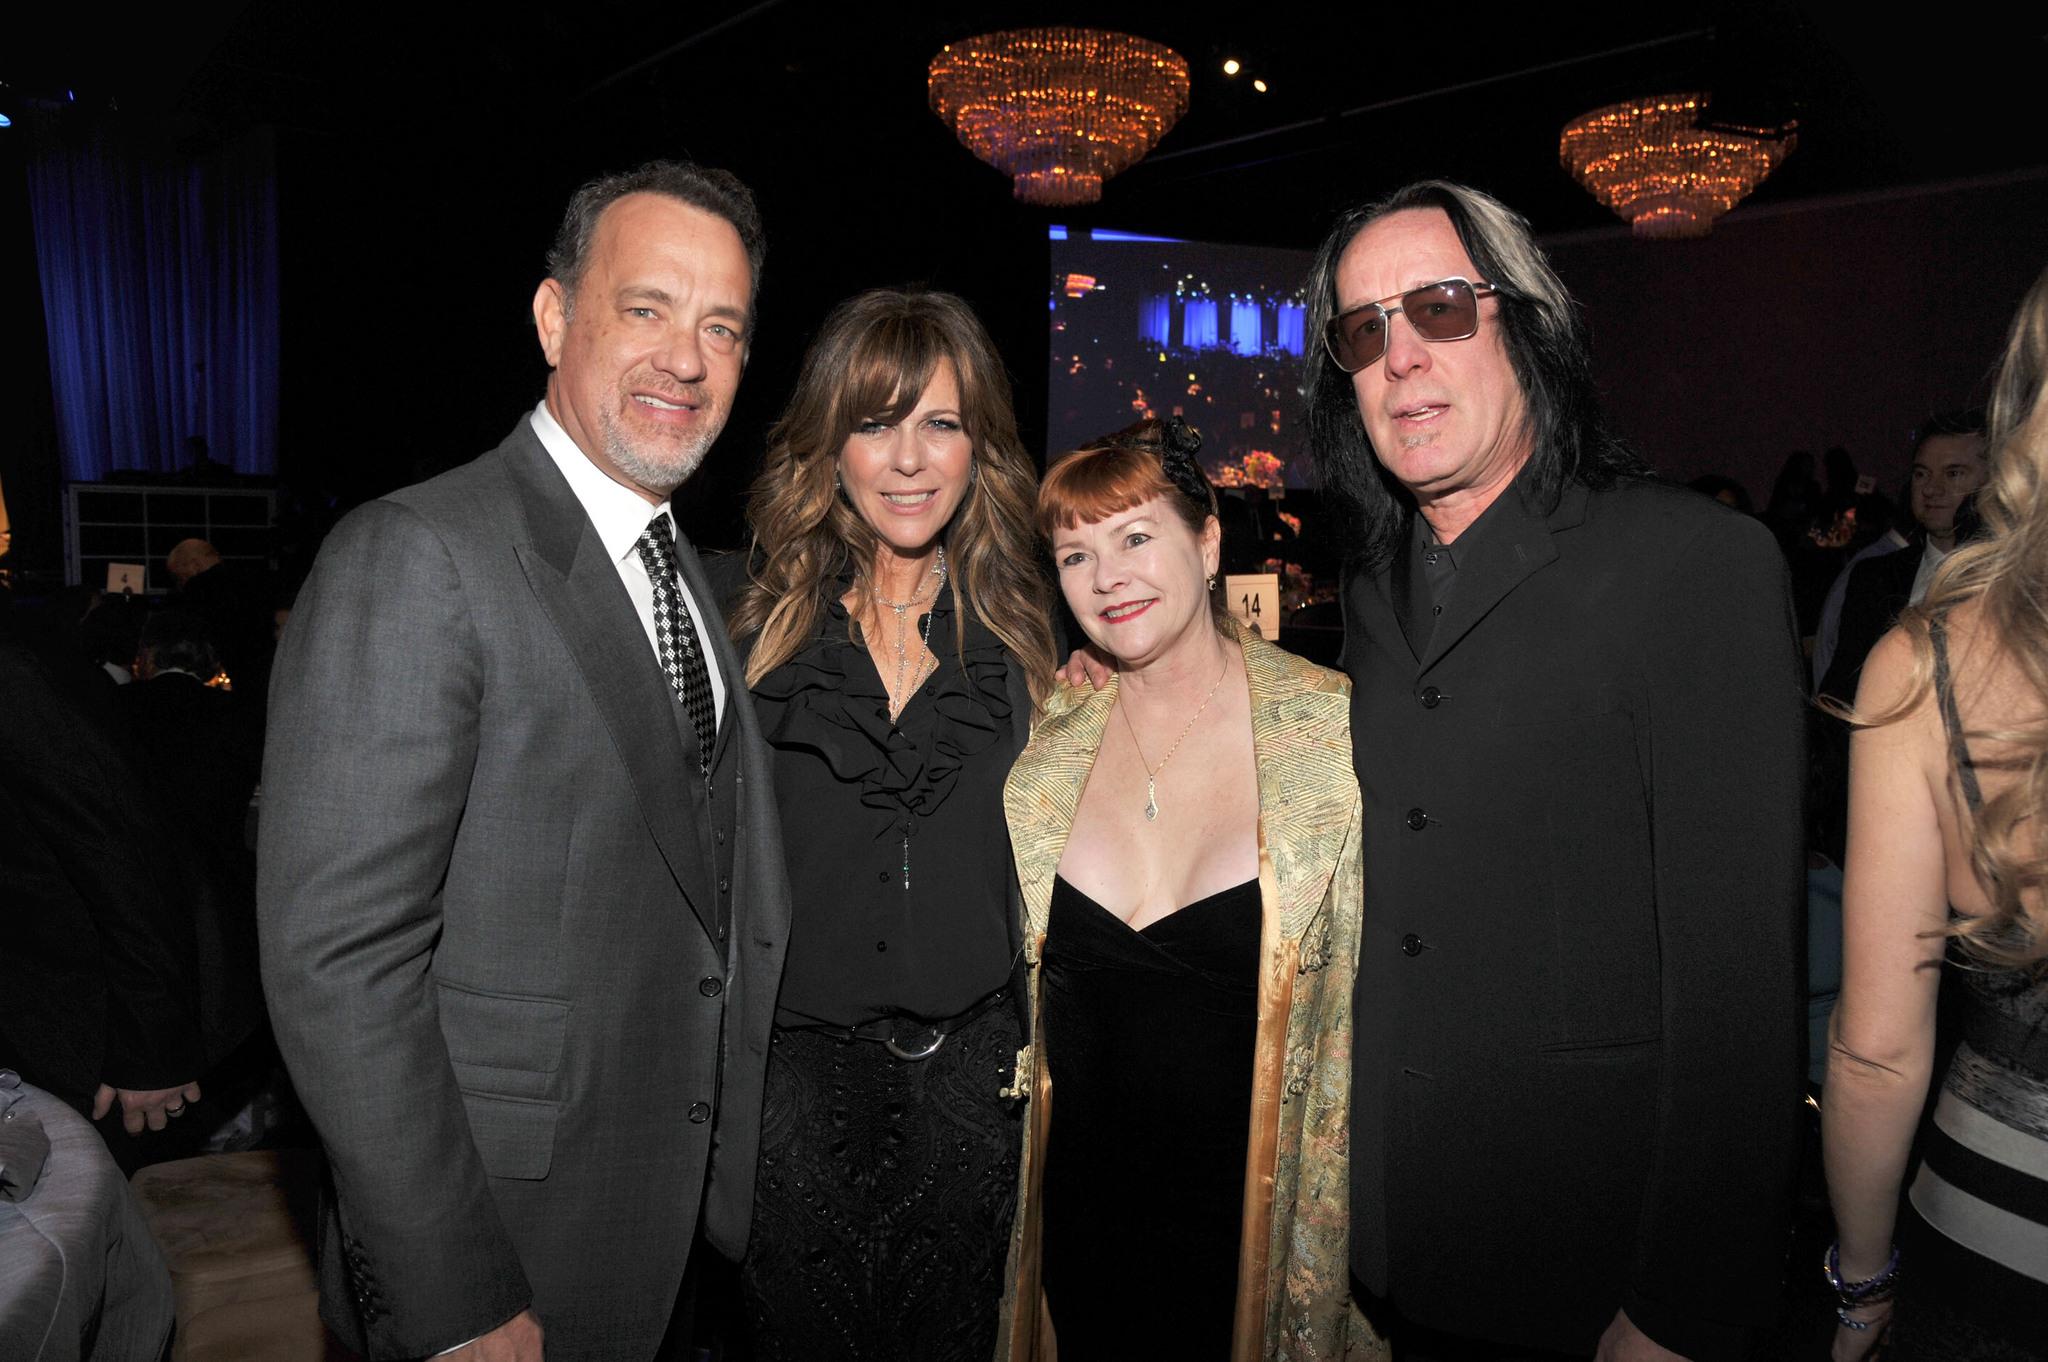 Tom Hanks, Rita Wilson and Todd Rundgren